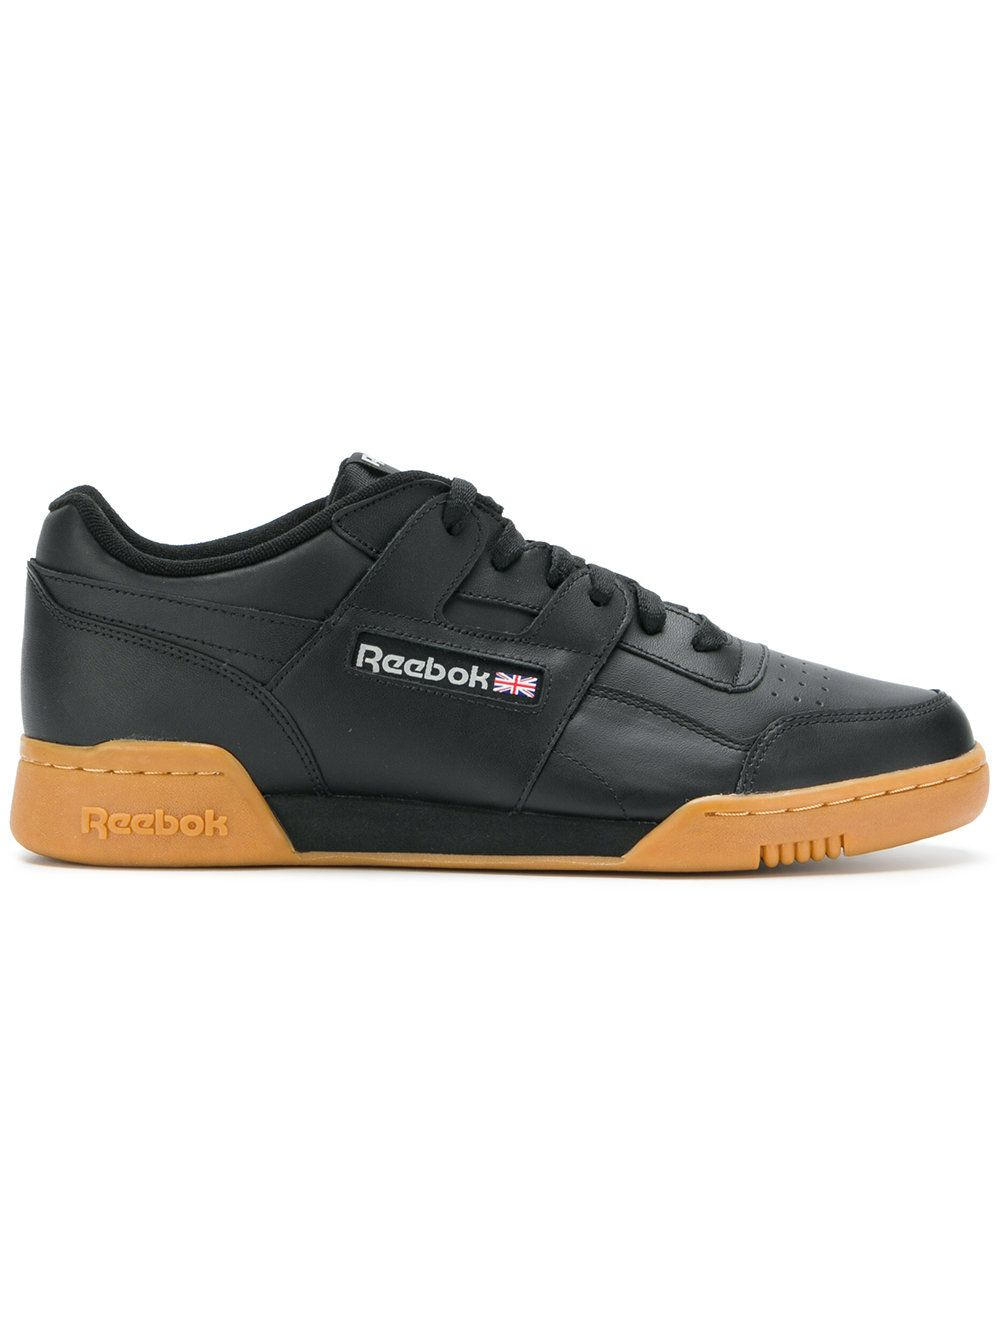 6cee87f49c3 REEBOK .  reebok  shoes